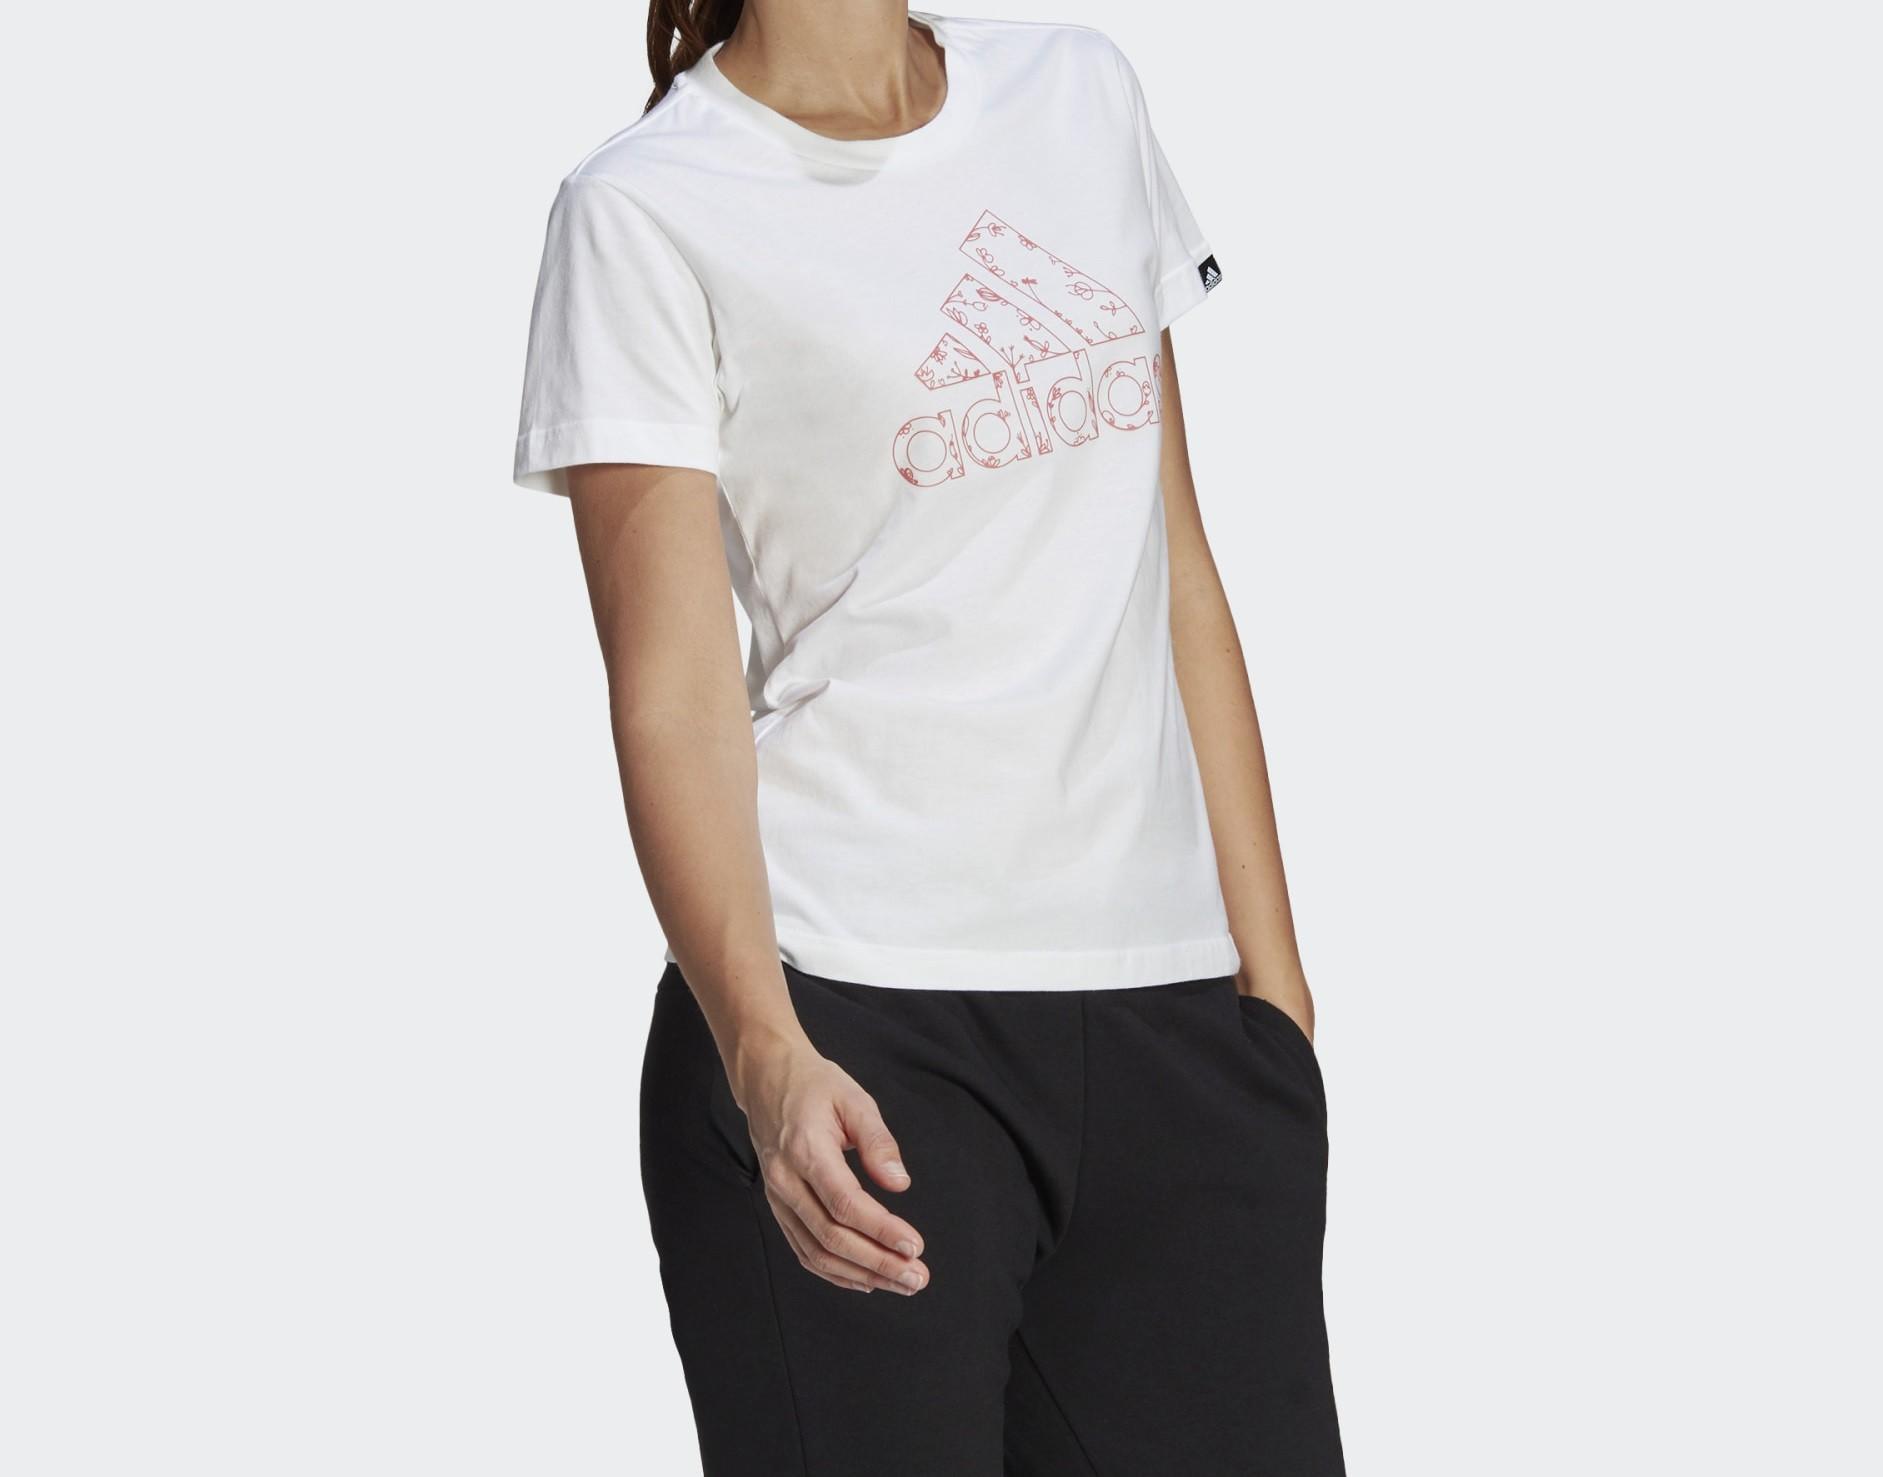 Camiseta Adidas Outline Floral Feminina Branco e Rosa